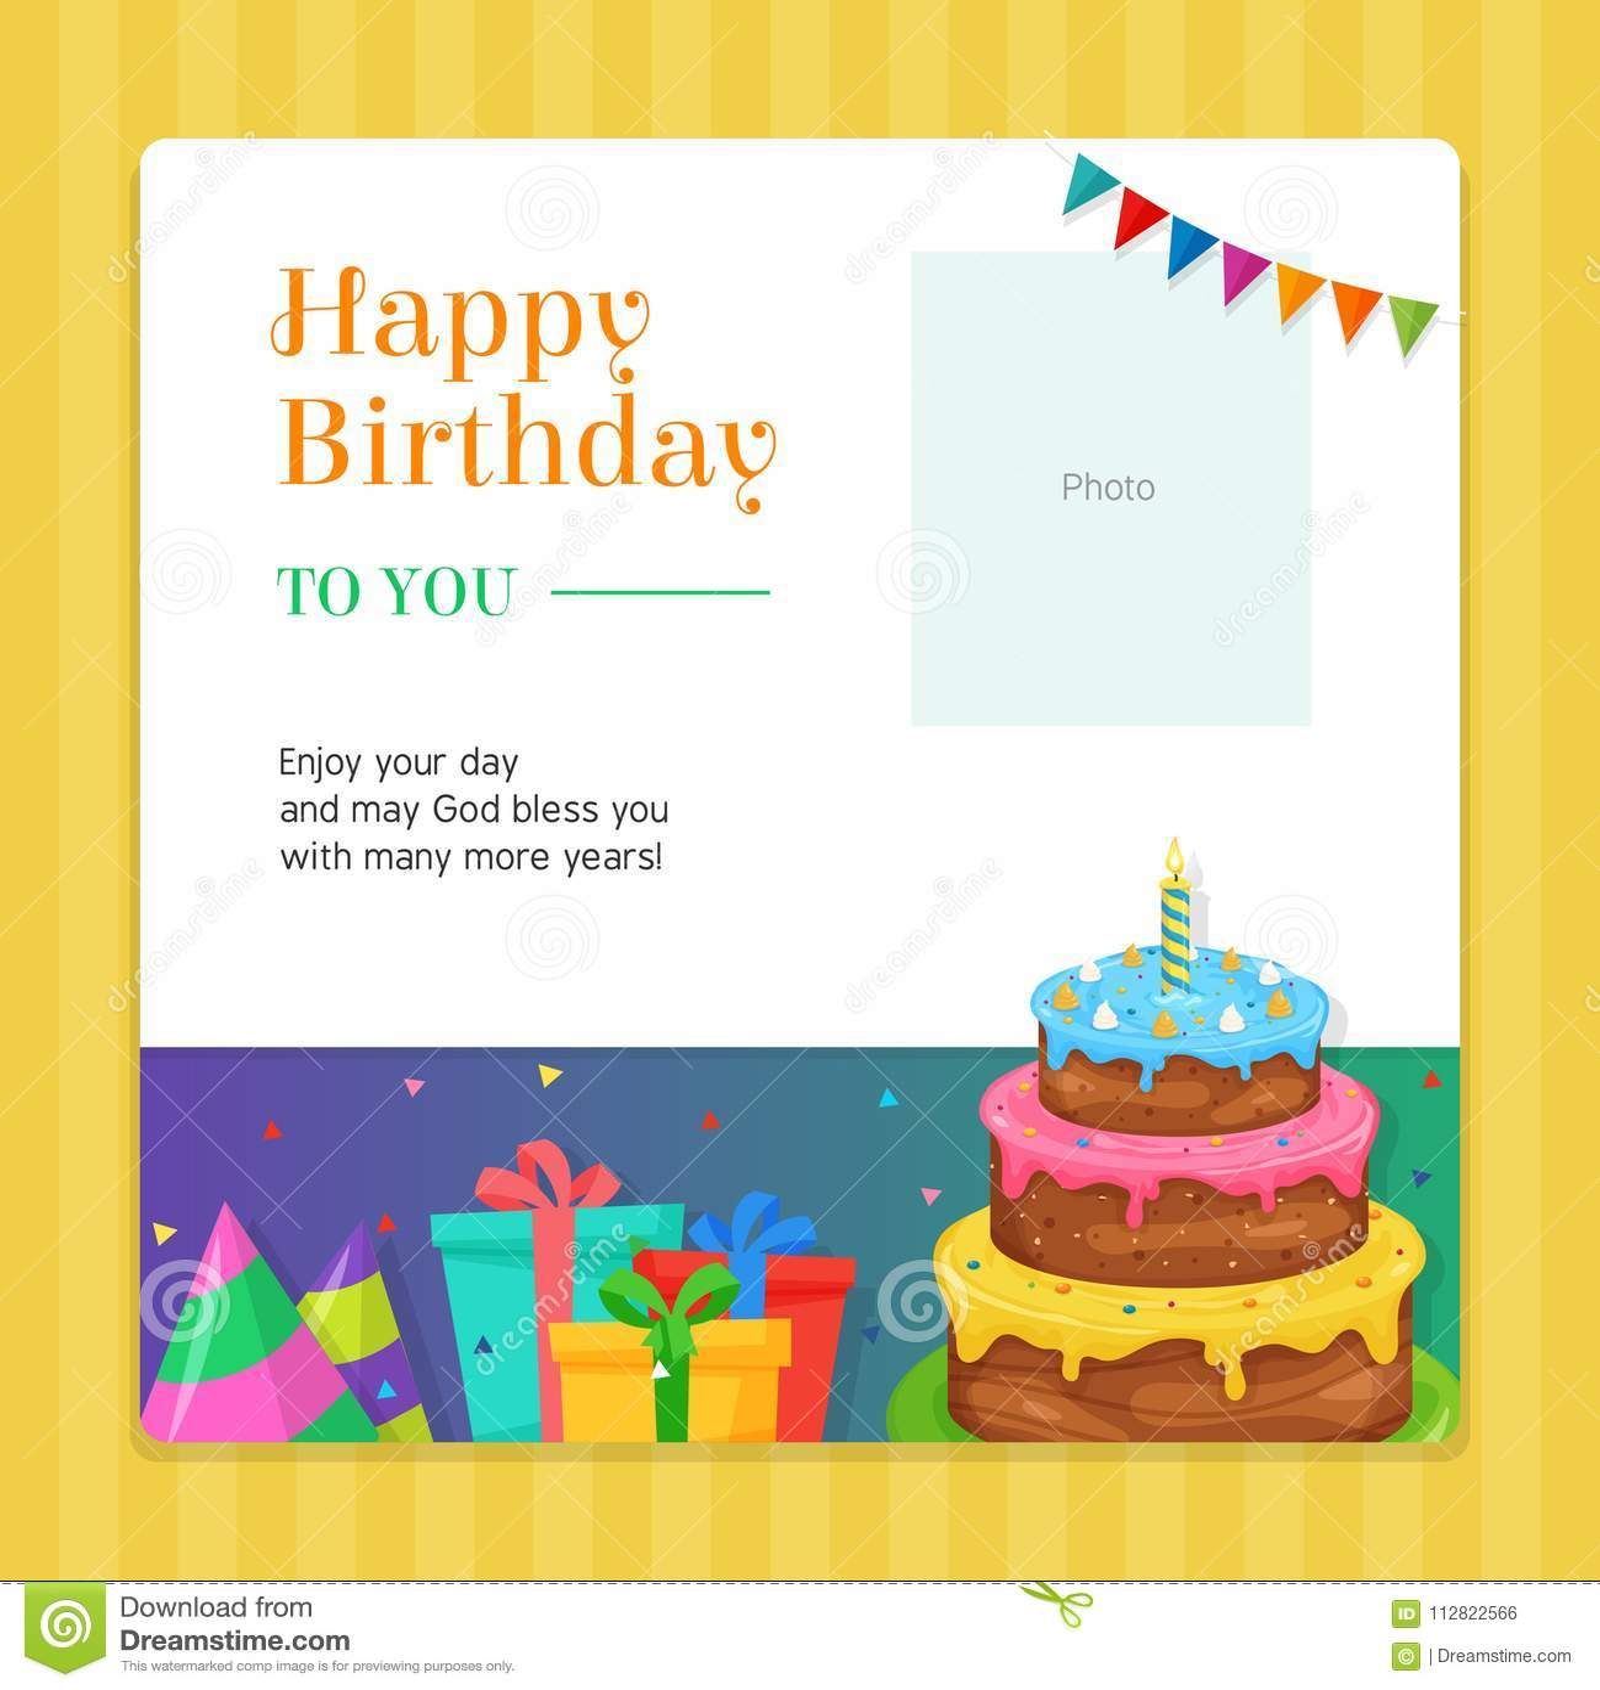 Swell Happy Birthday Modern Invitation Card Template With Birthday Cake Funny Birthday Cards Online Inifodamsfinfo